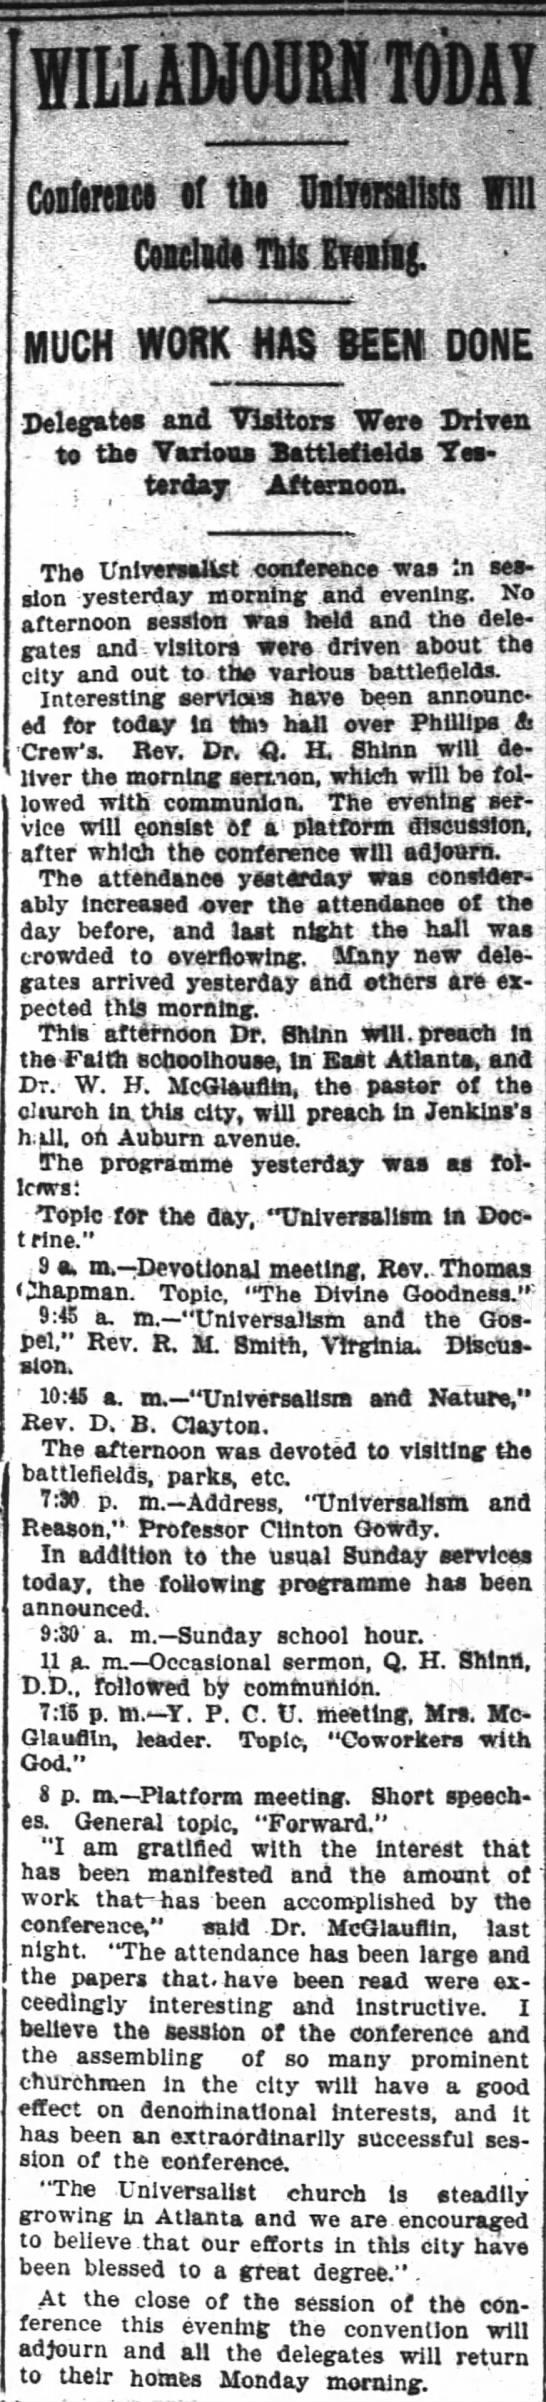 1896.10.25 Universalist Conference Concludes -